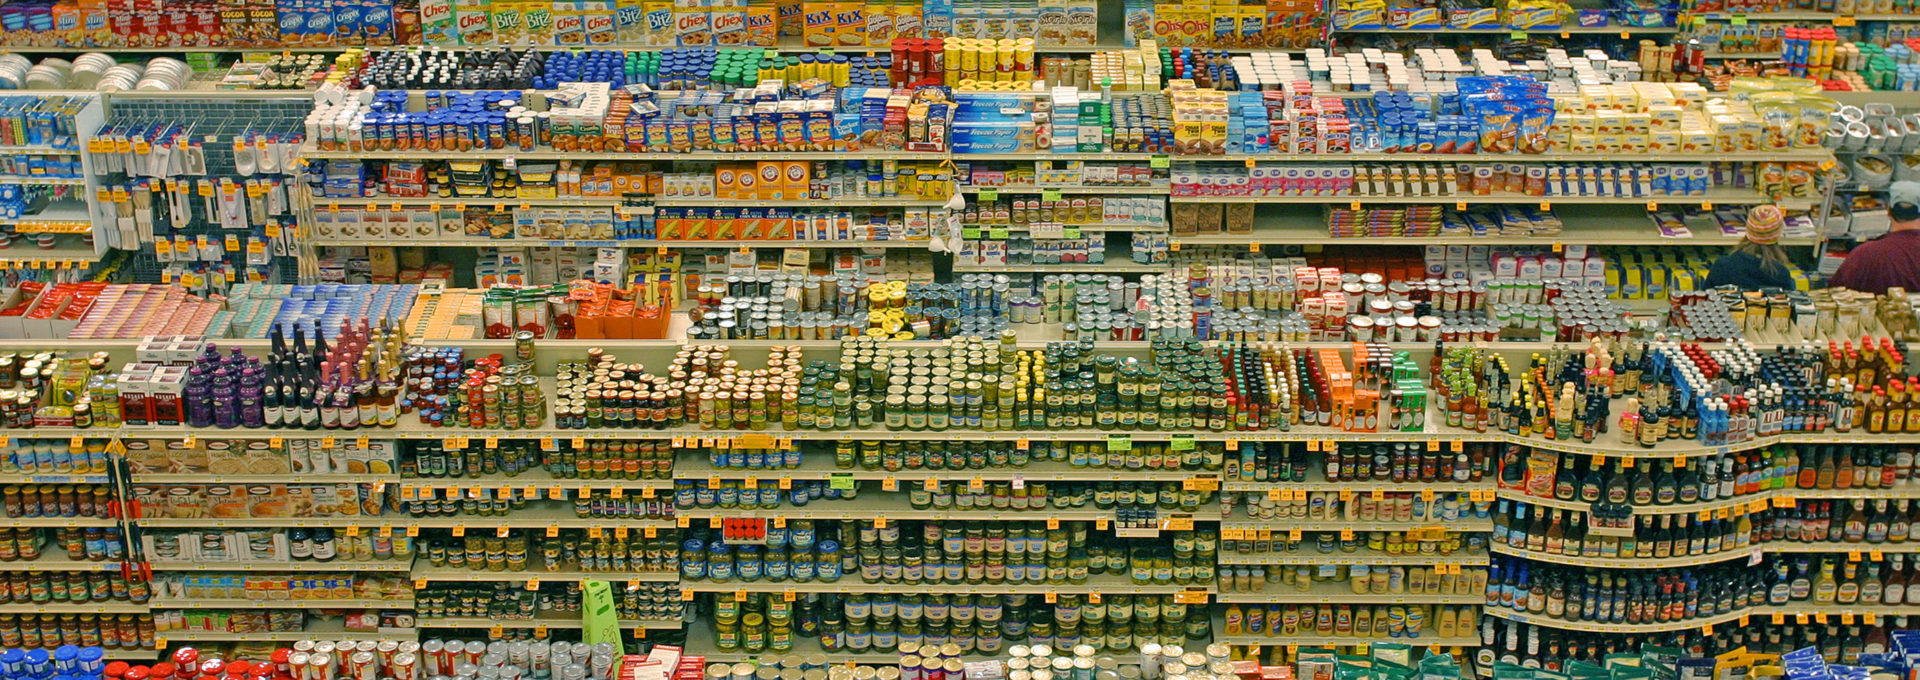 Biodiversity in the Supermarket